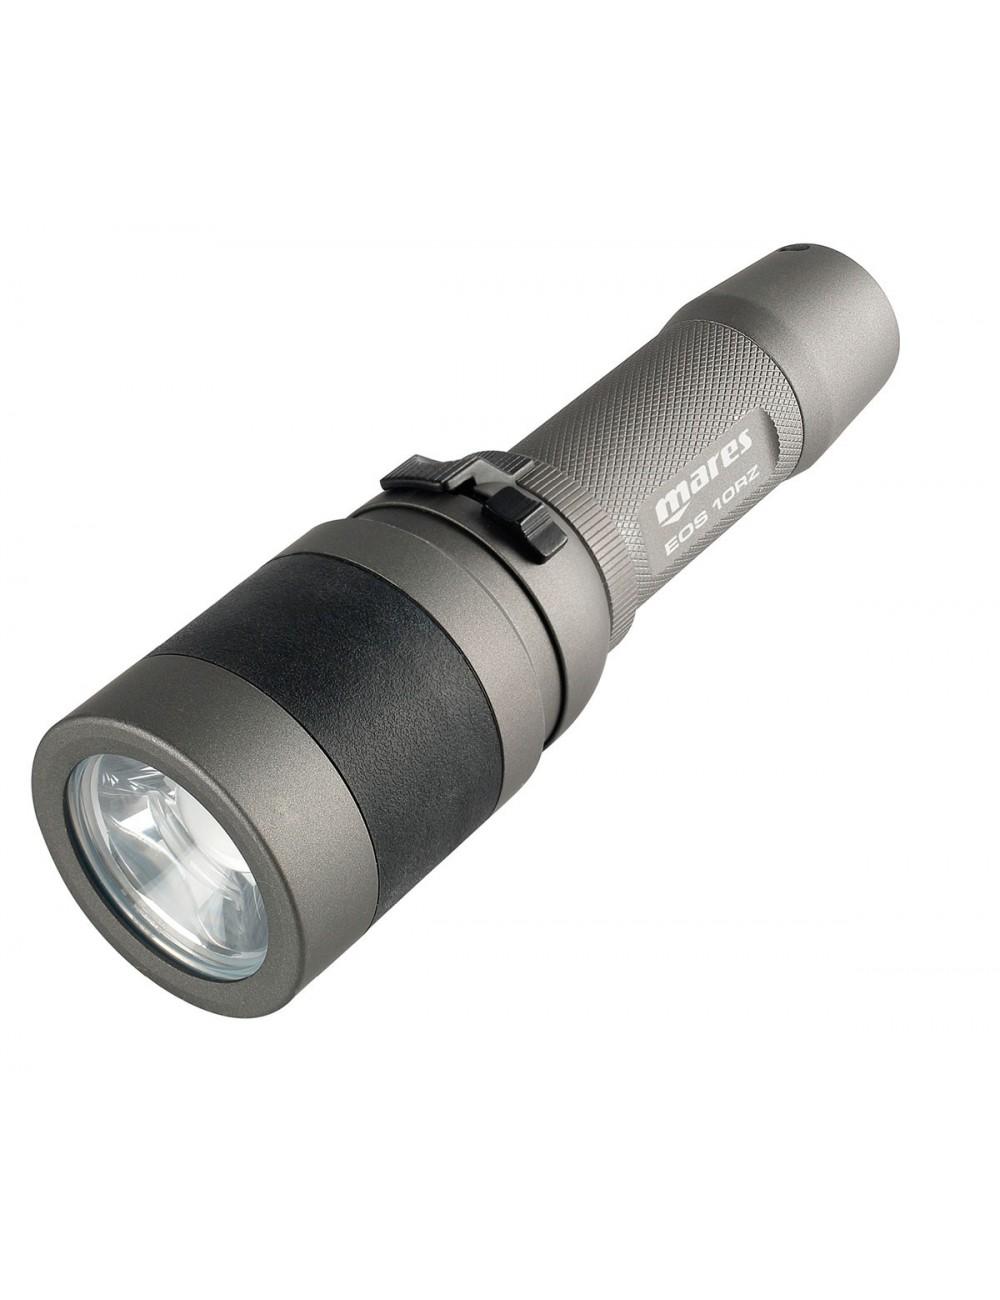 Lampe 10 1010 Eos Torche Lumen Mares Rz Nk0wP8nOX